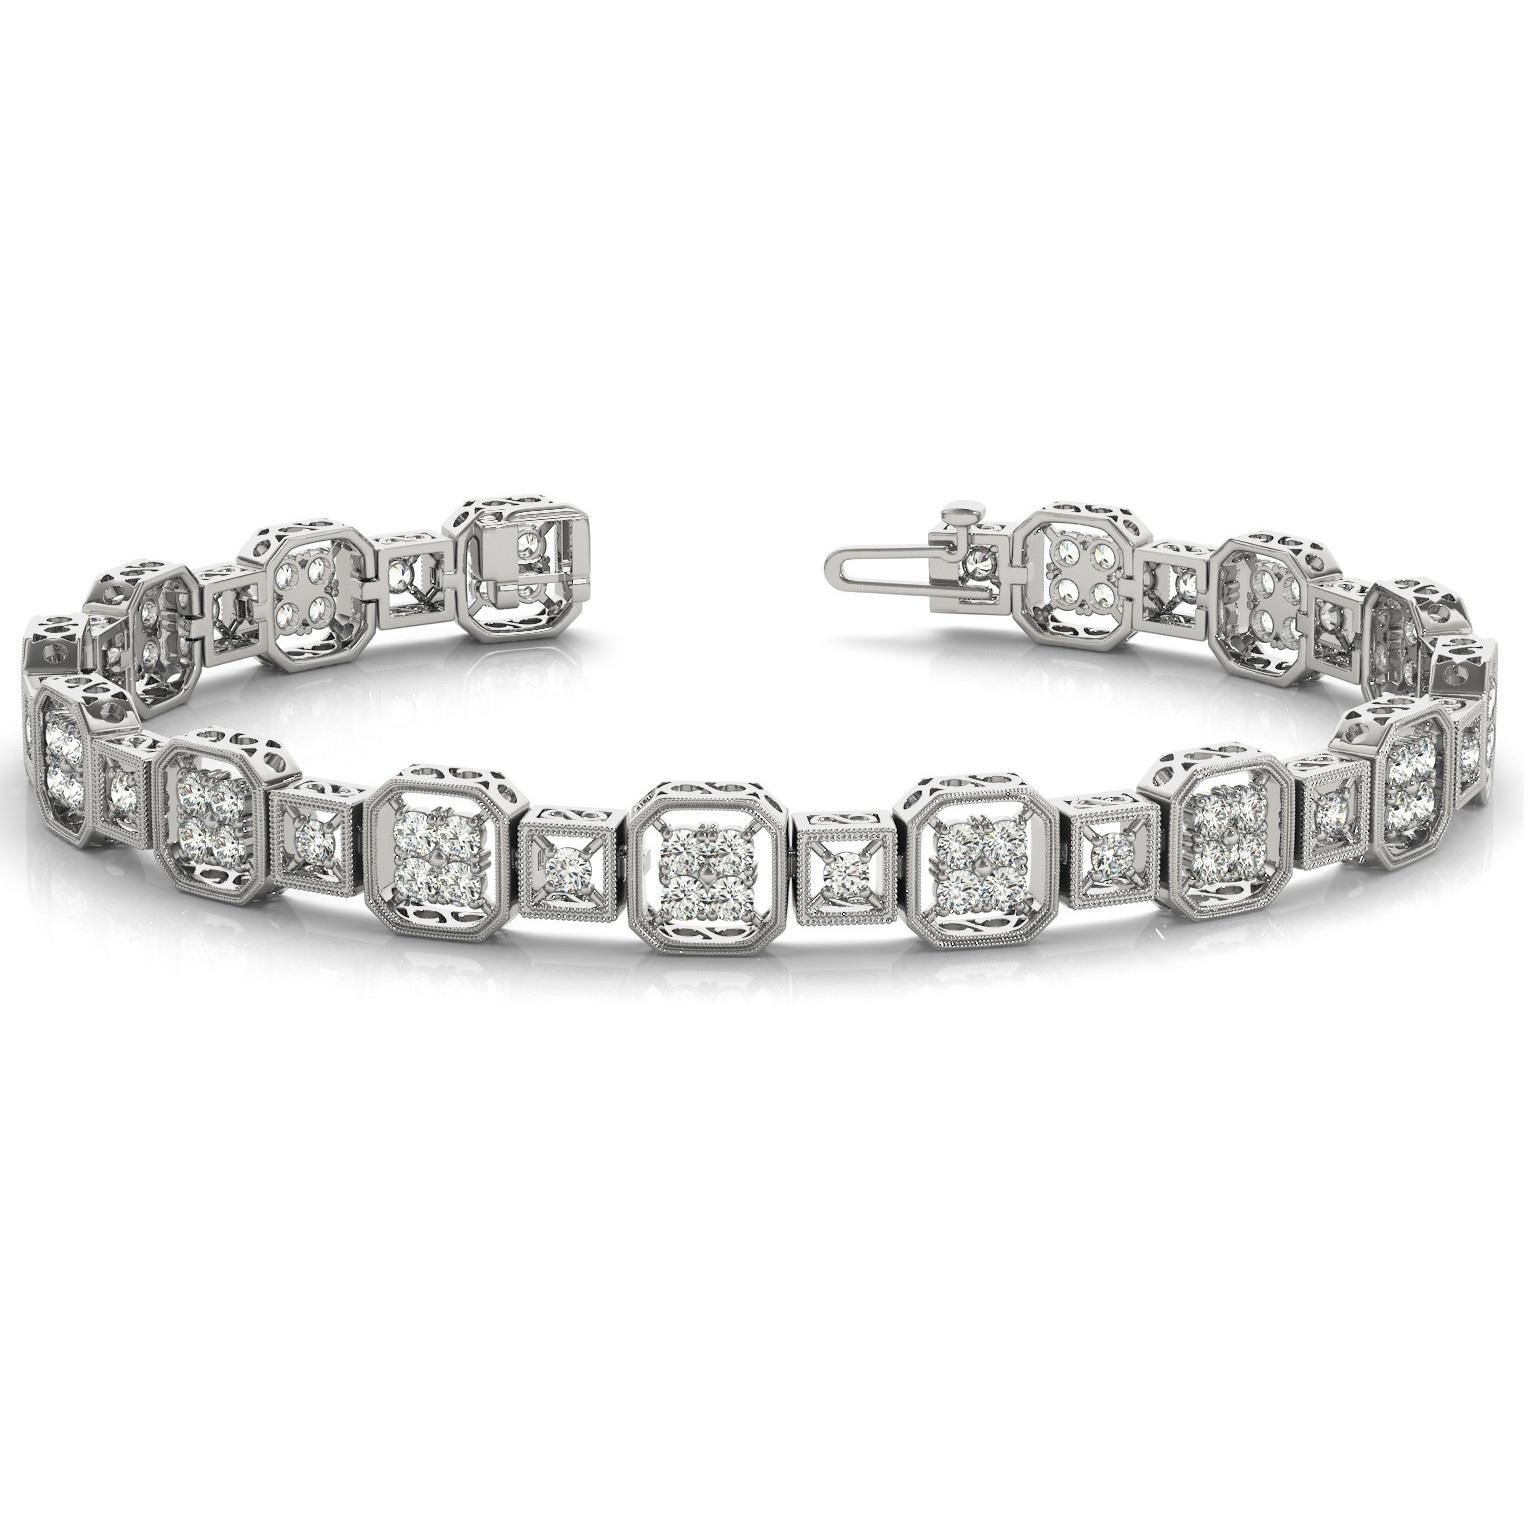 Diamond Vintage Square Tennis Link Bracelet 14k White Gold from Allurez.